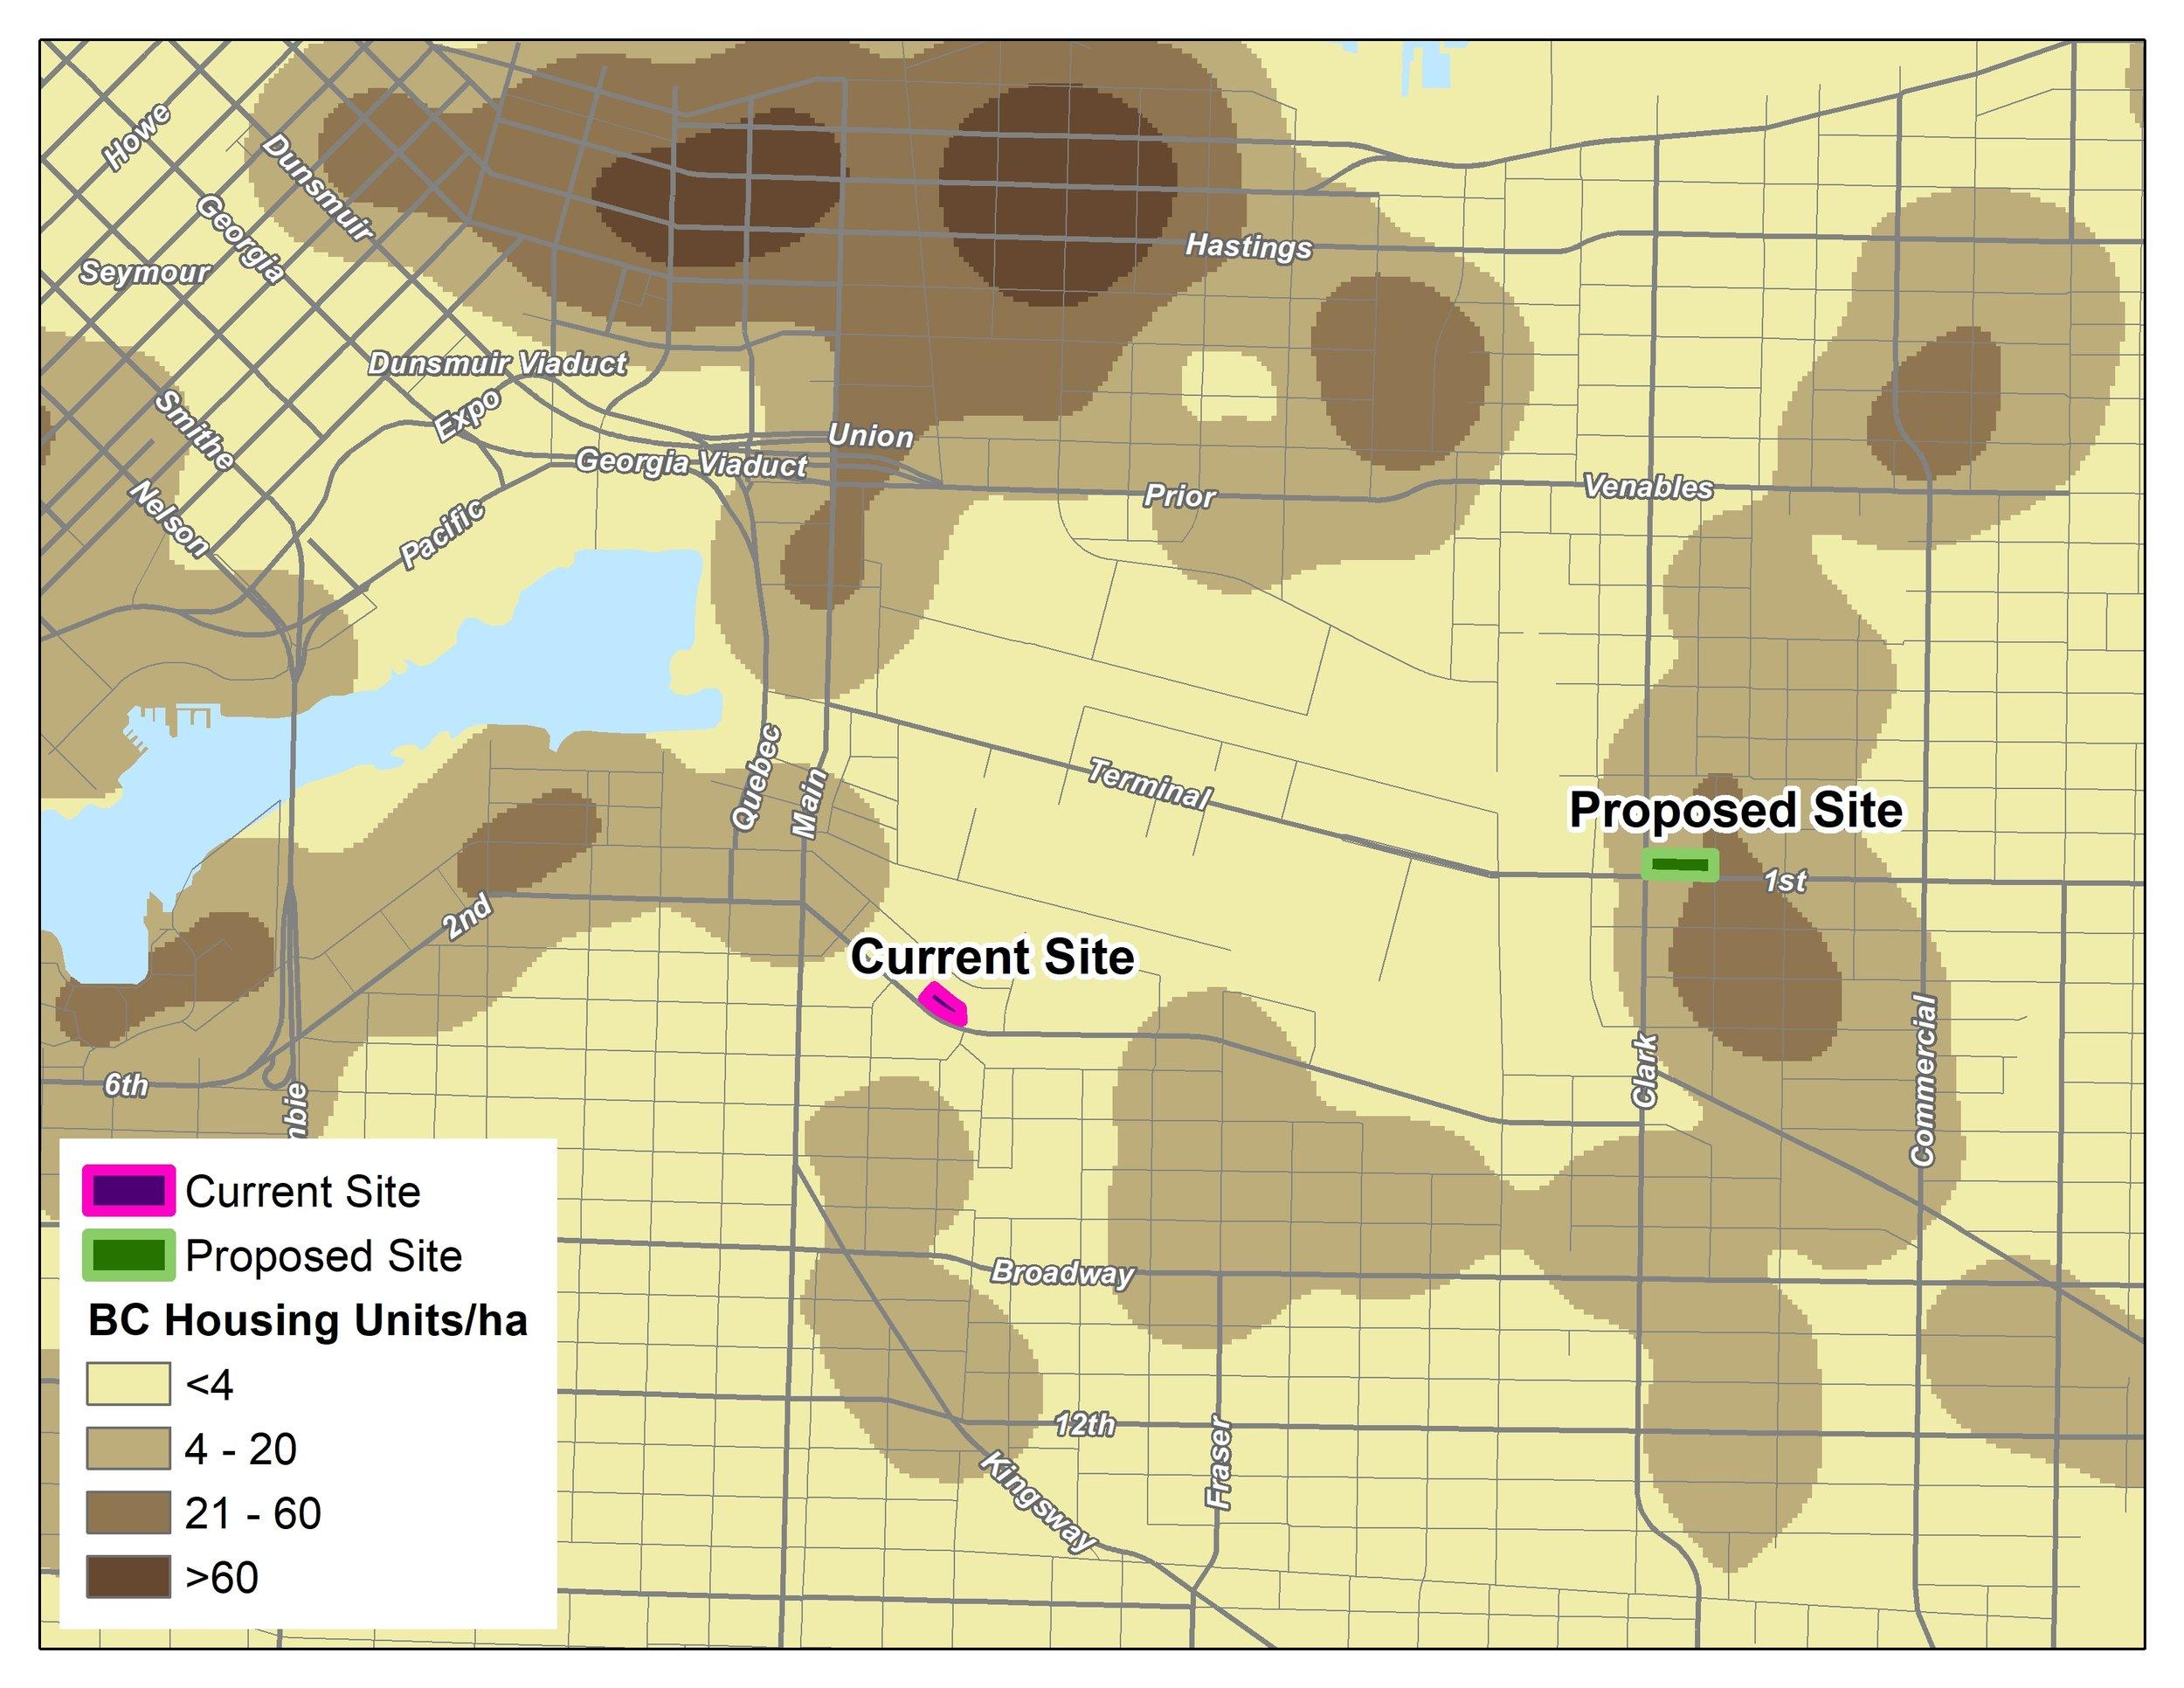 BC Housing Density_2.jpg